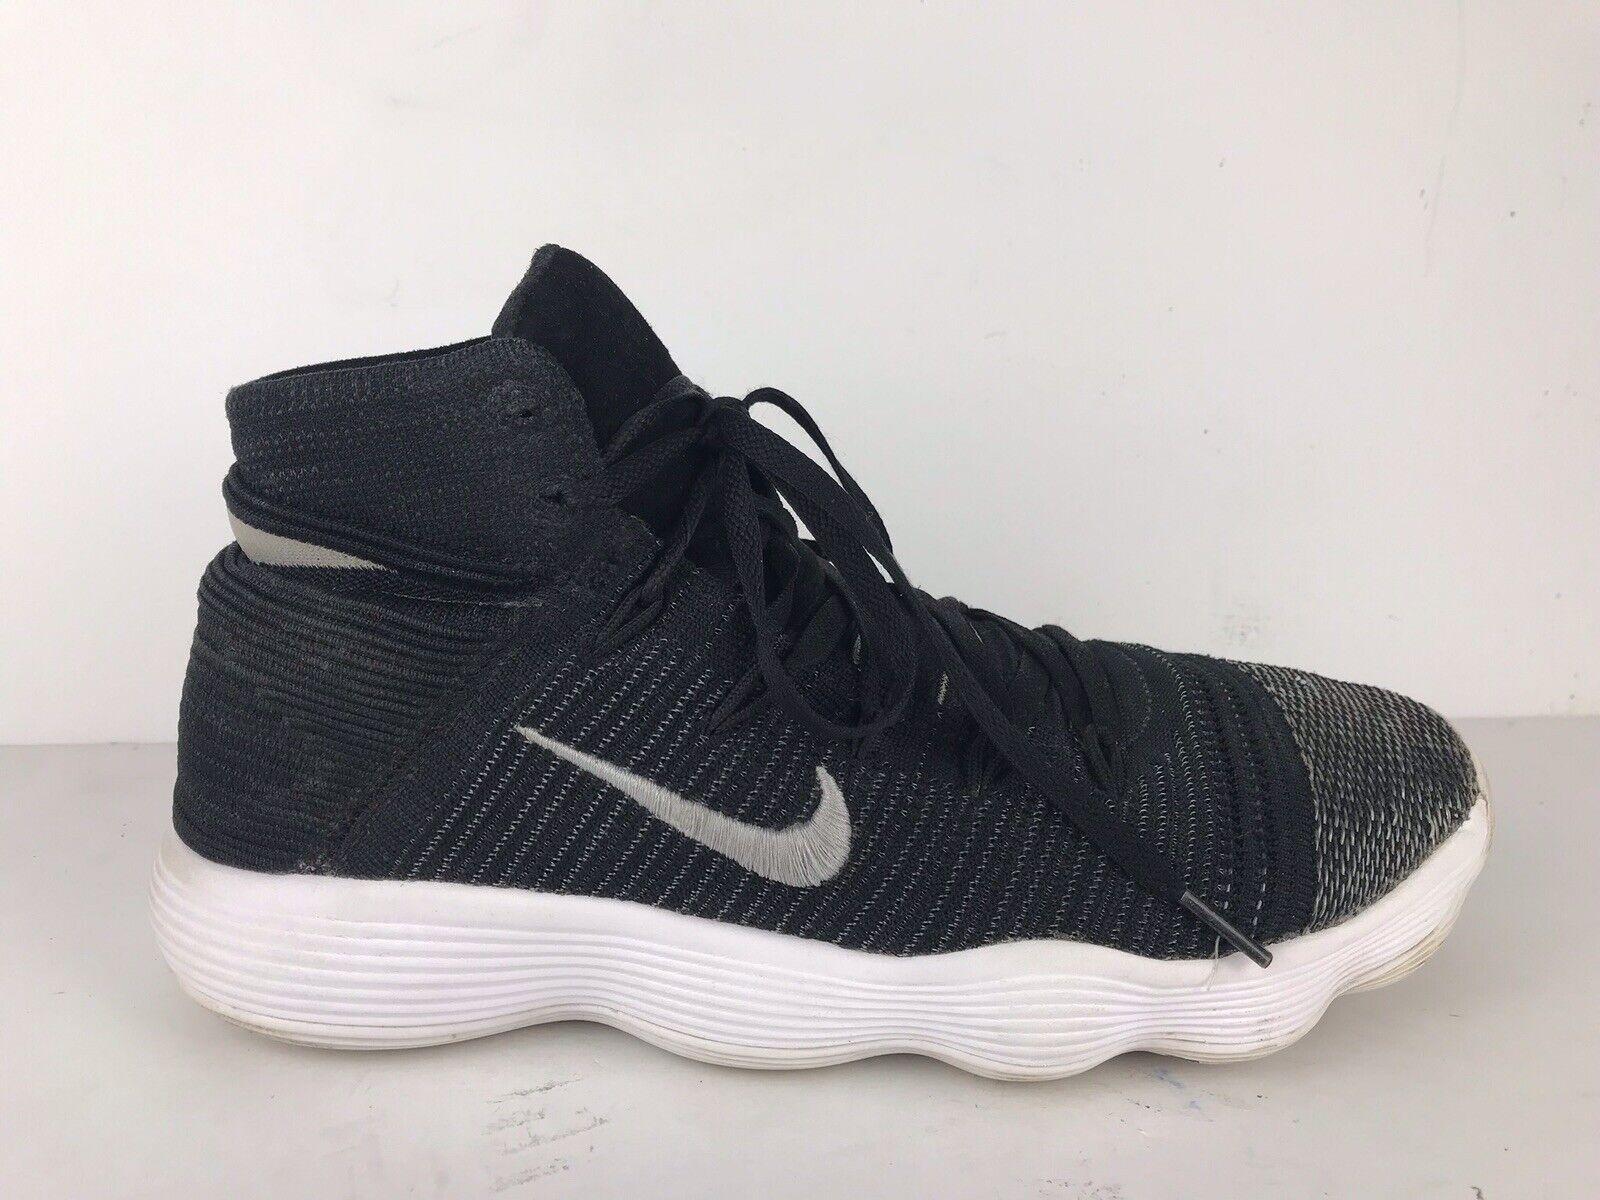 Nike Hyperdunk Flyknit 2017 Mens Size 10.5 Black and White 917726 001